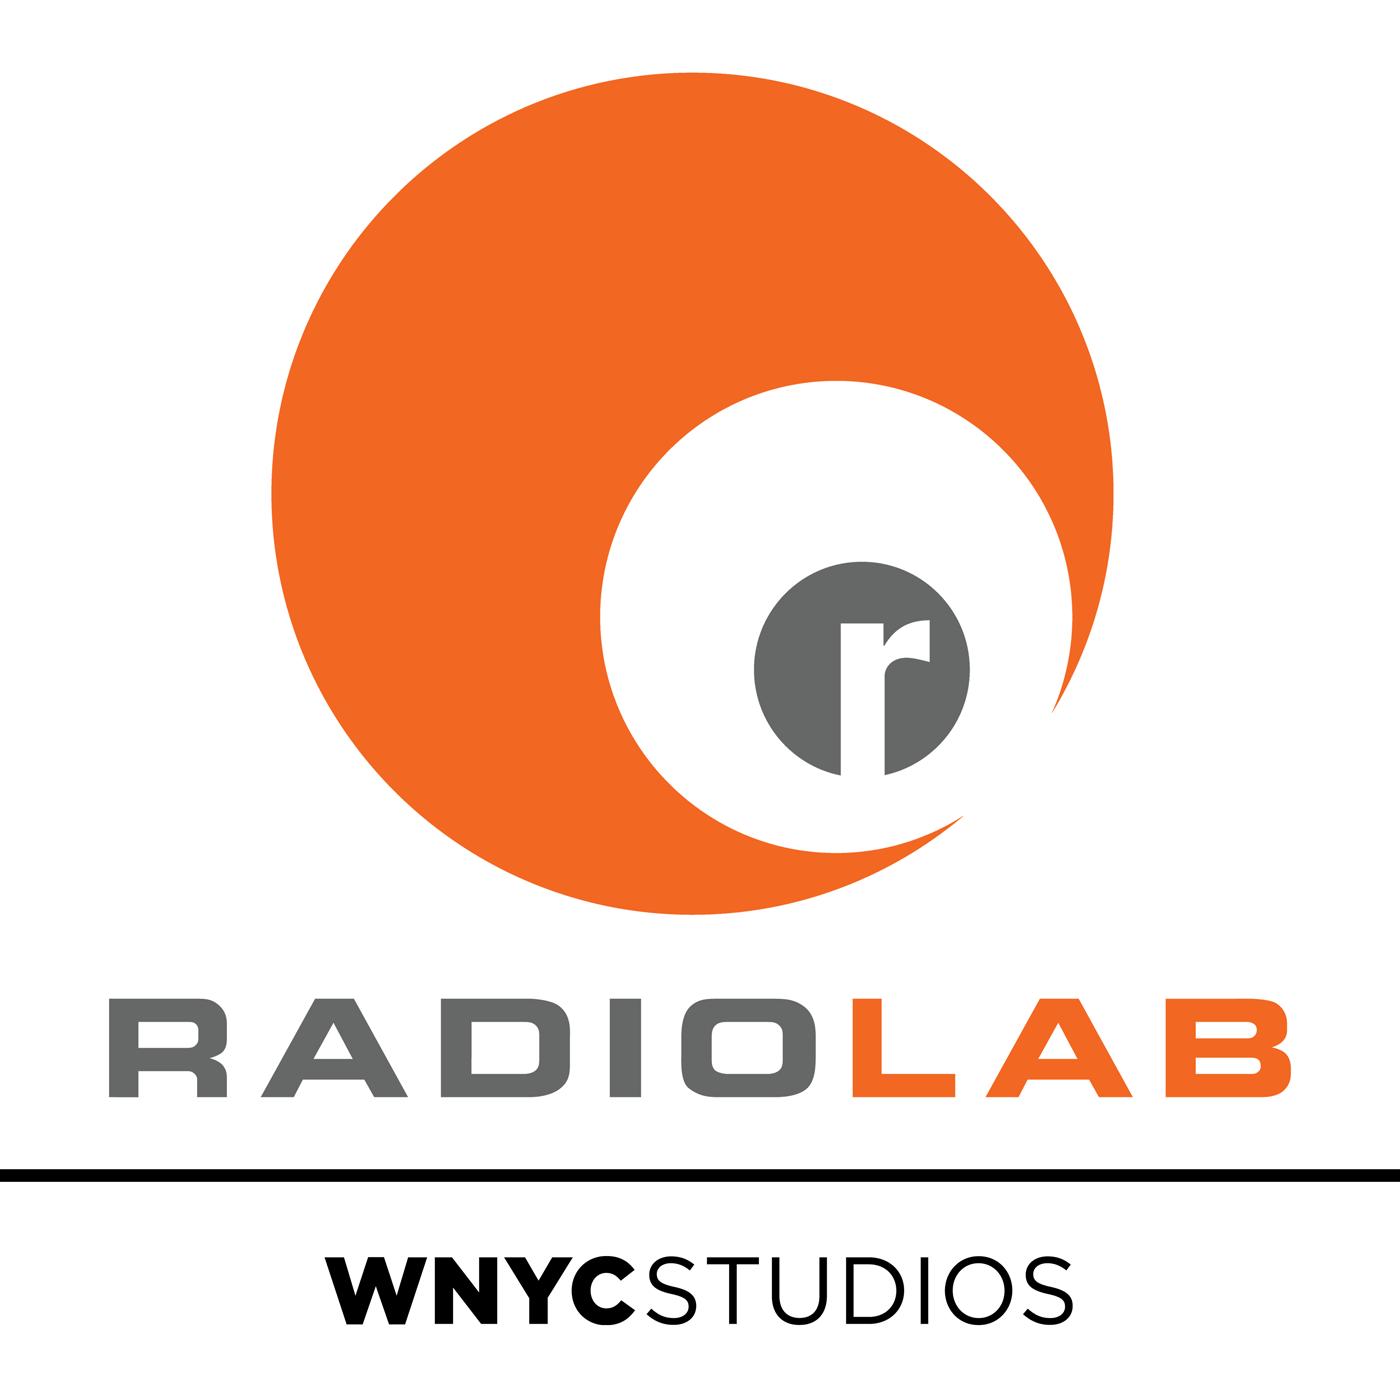 Radiolab_WNYCStudios_1400_x.png